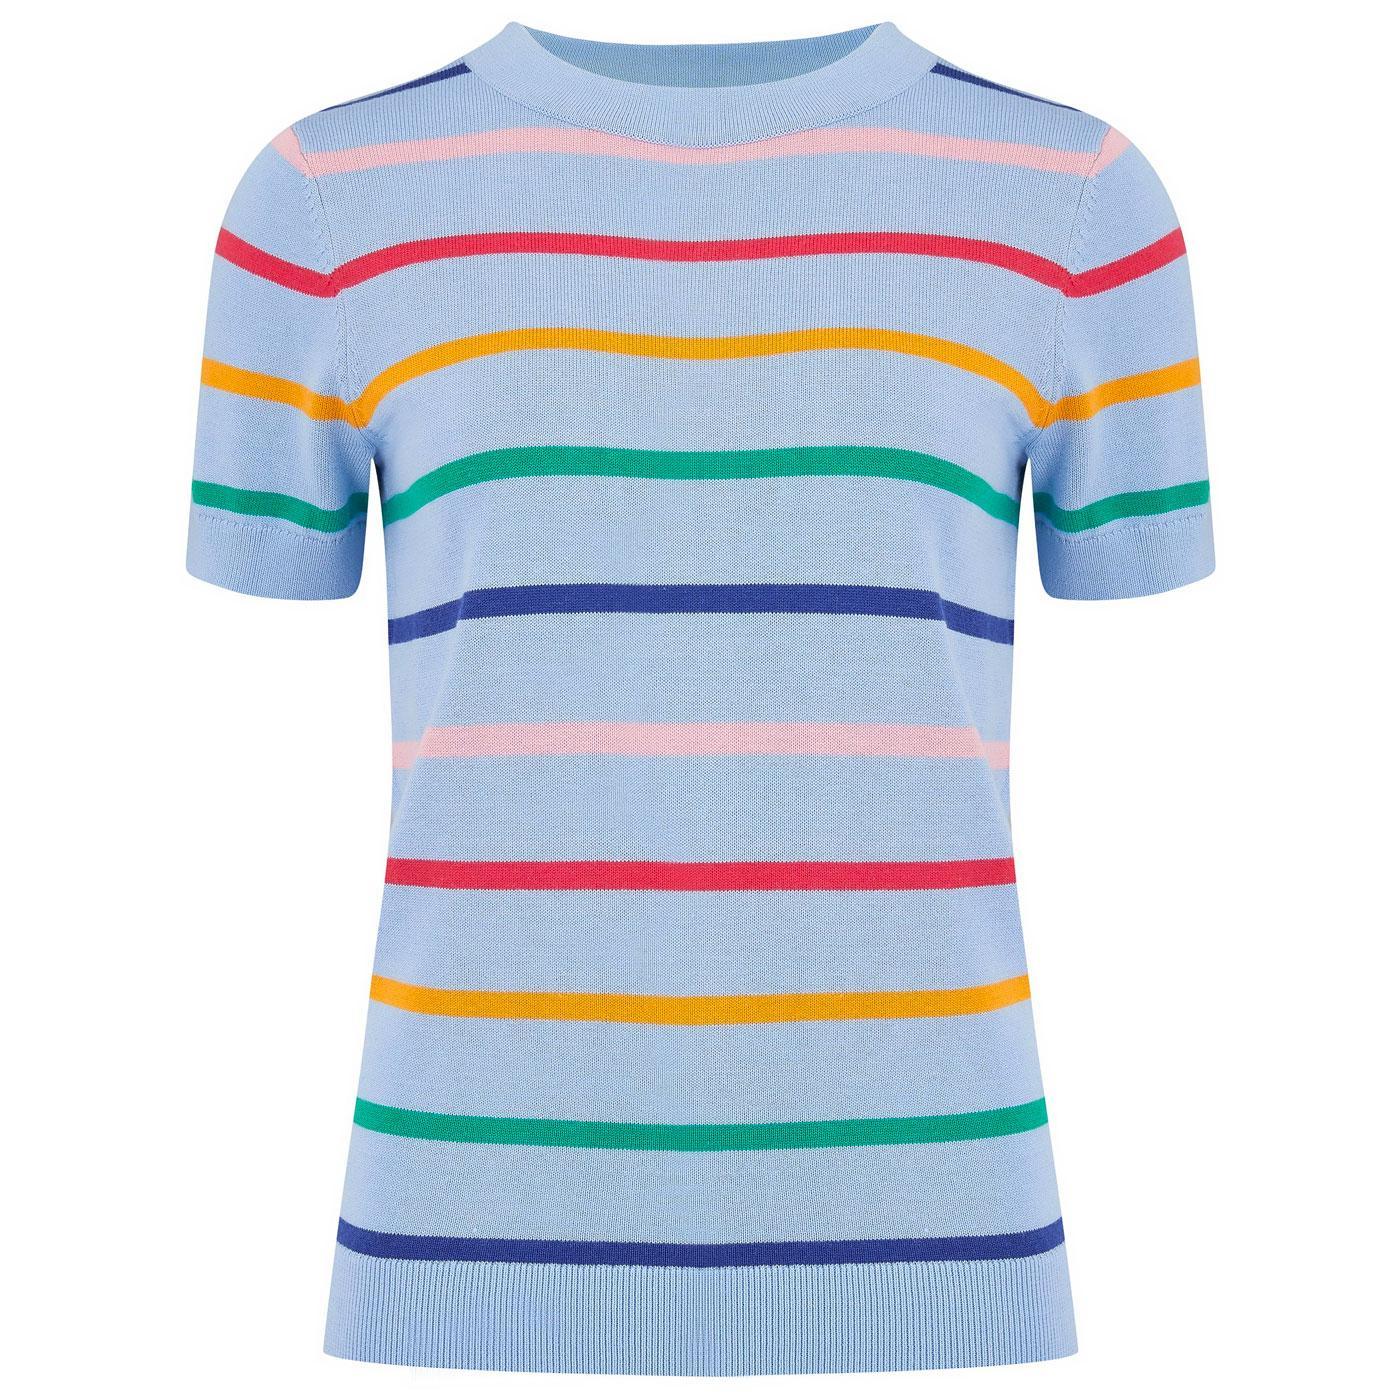 Anoki SUGARHILL Retro Daytripper Stripe Knit Tee